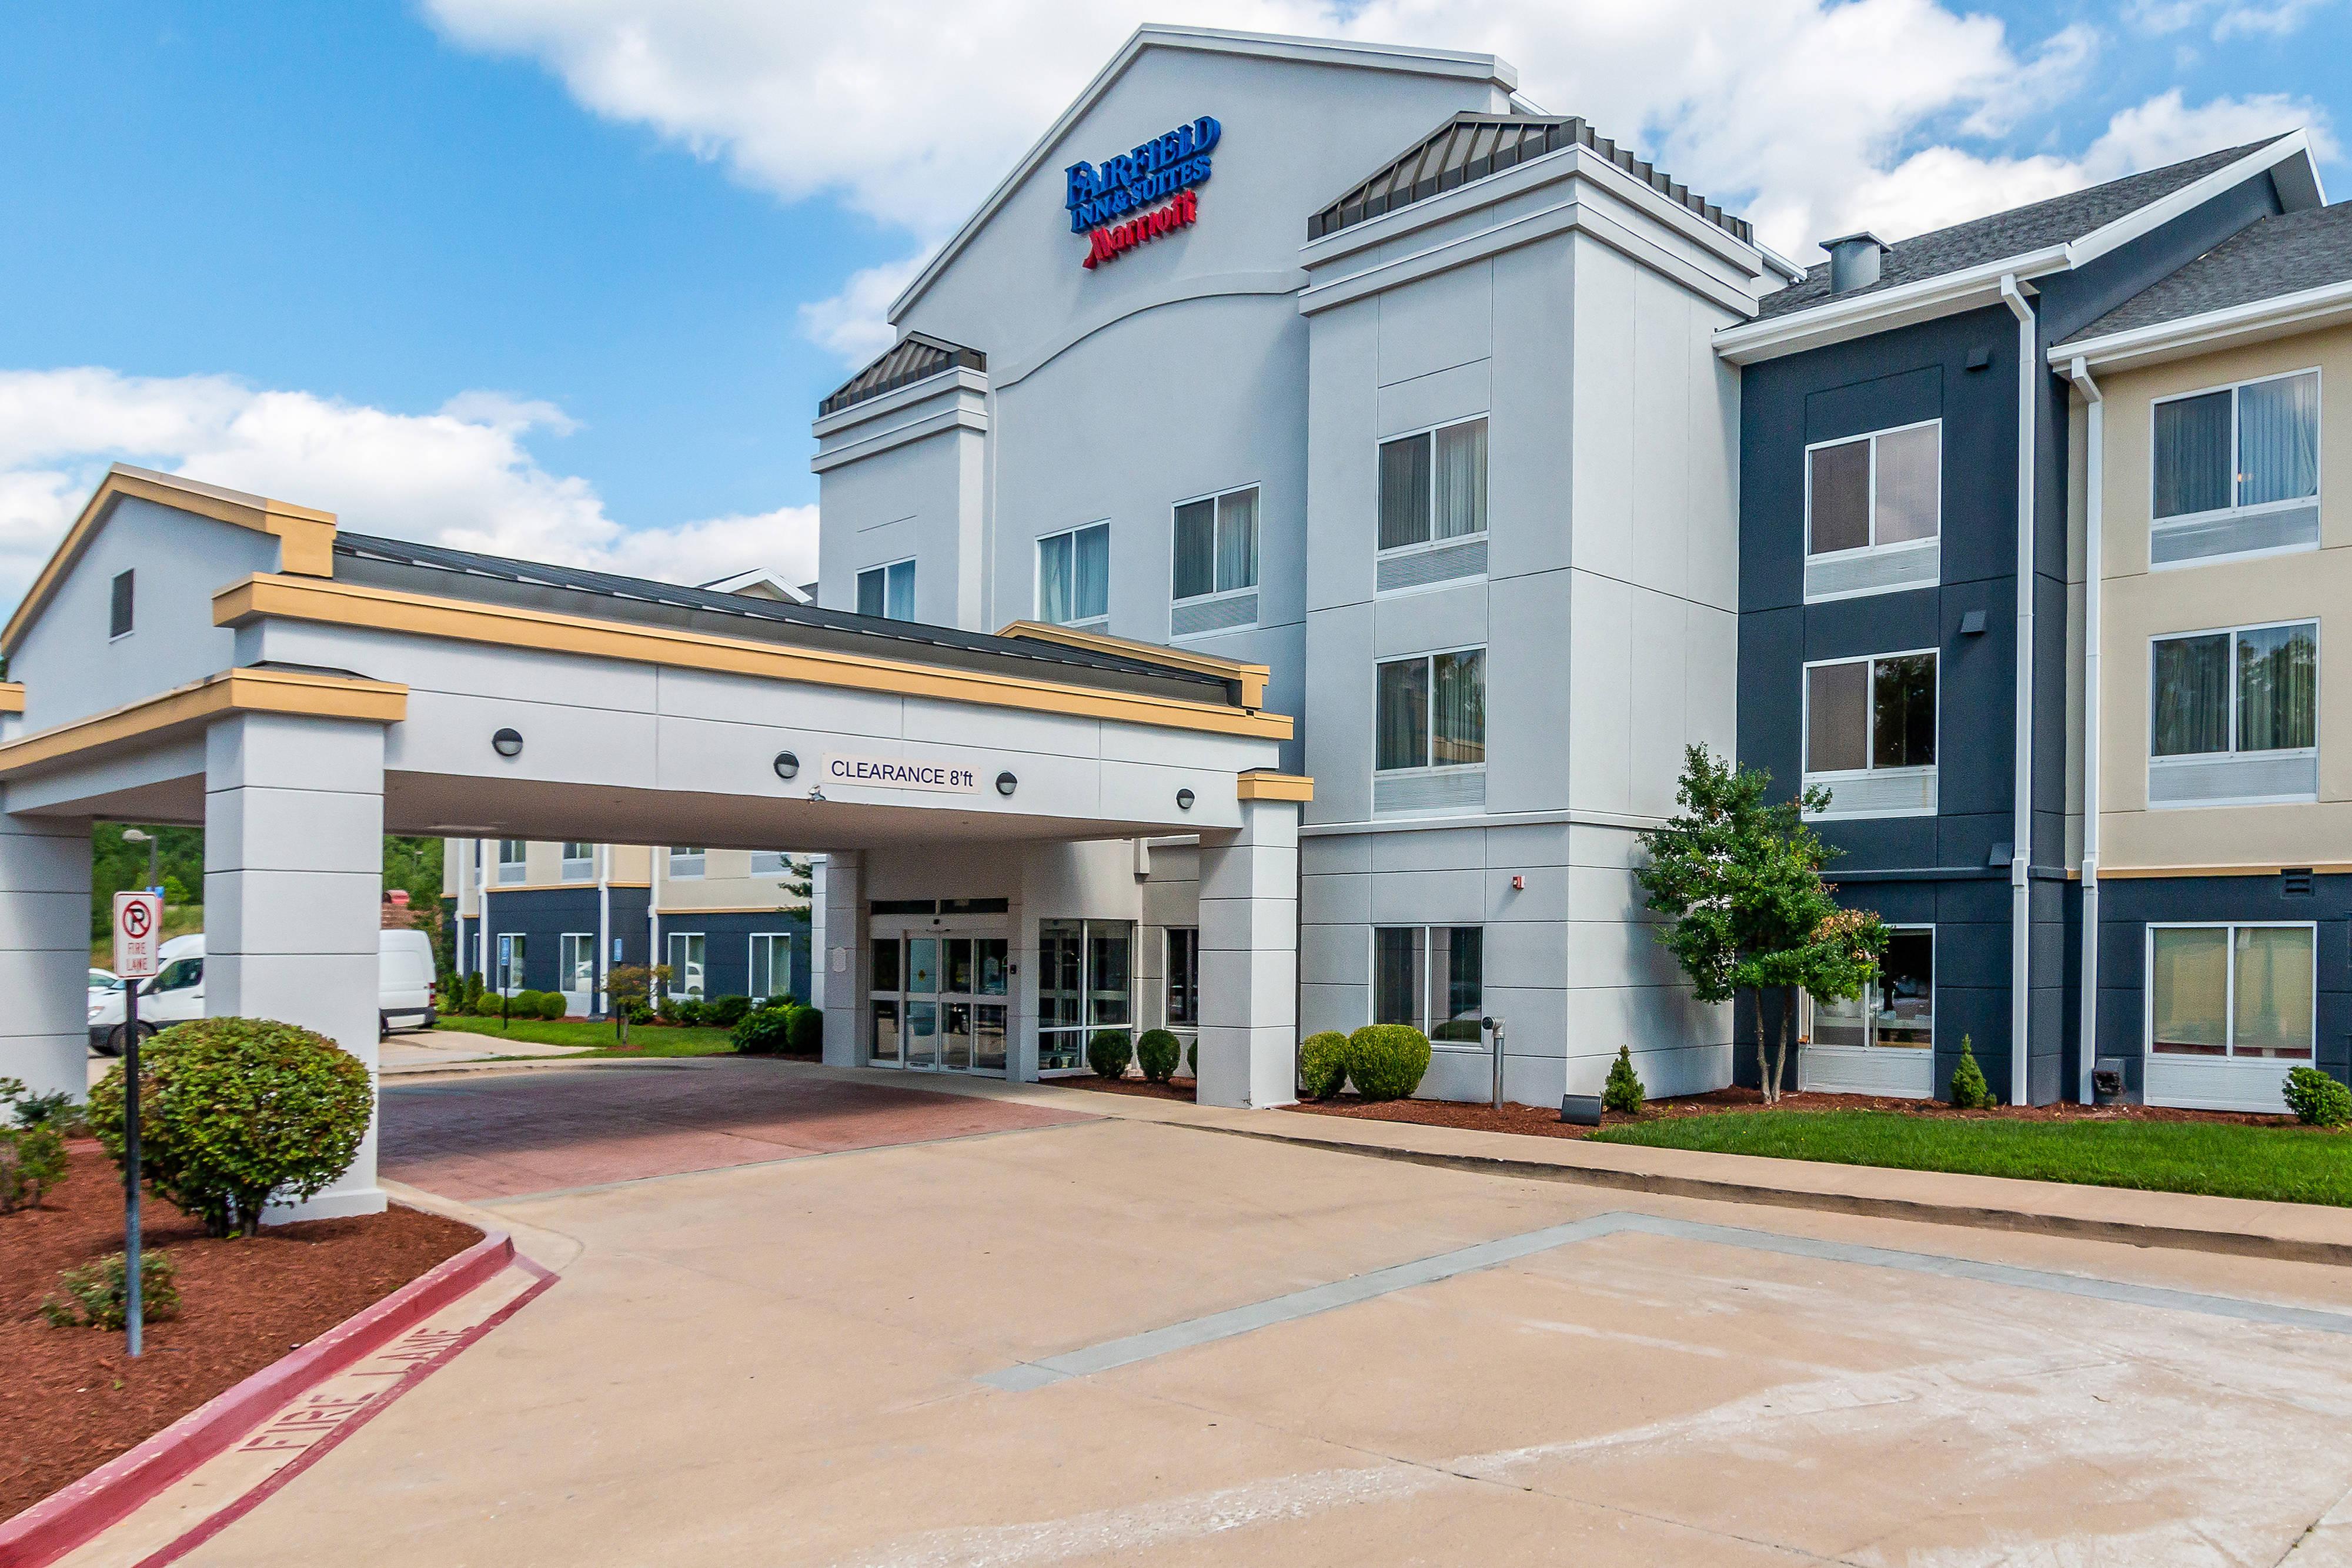 Fairfield Inn & Suites By Marriott Columbia